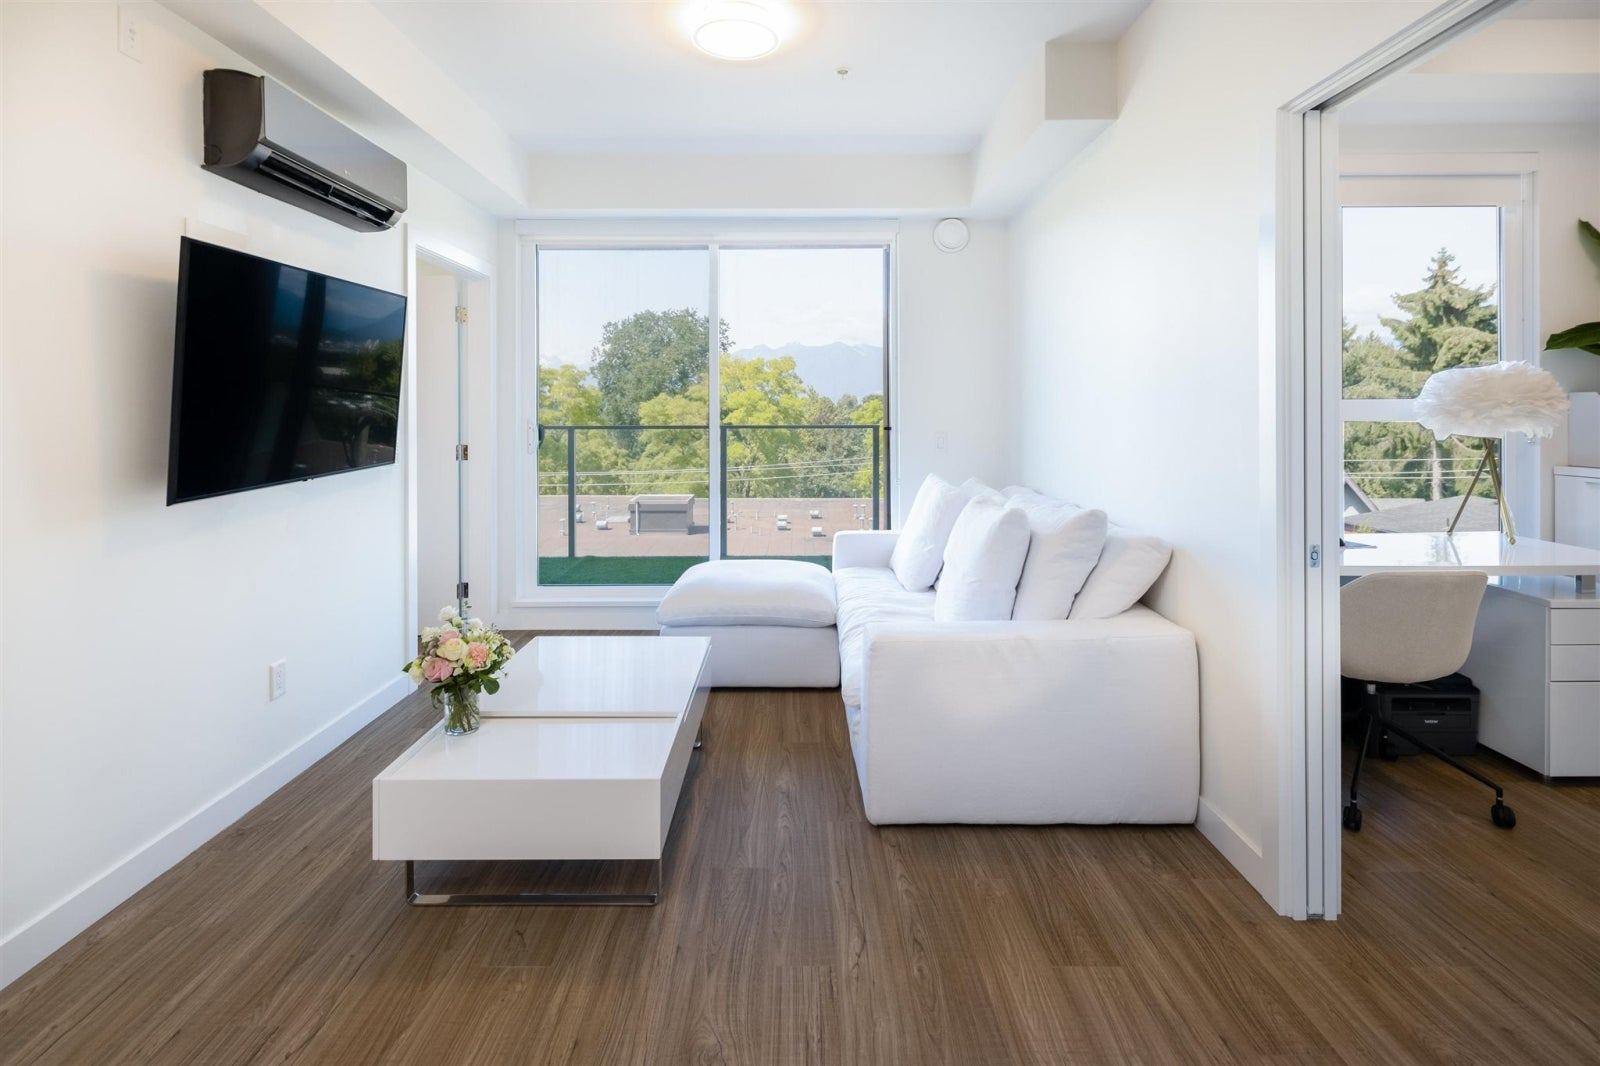 408 379 E BROADWAY AVENUE - Mount Pleasant VE Apartment/Condo for sale, 2 Bedrooms (R2599900) #1